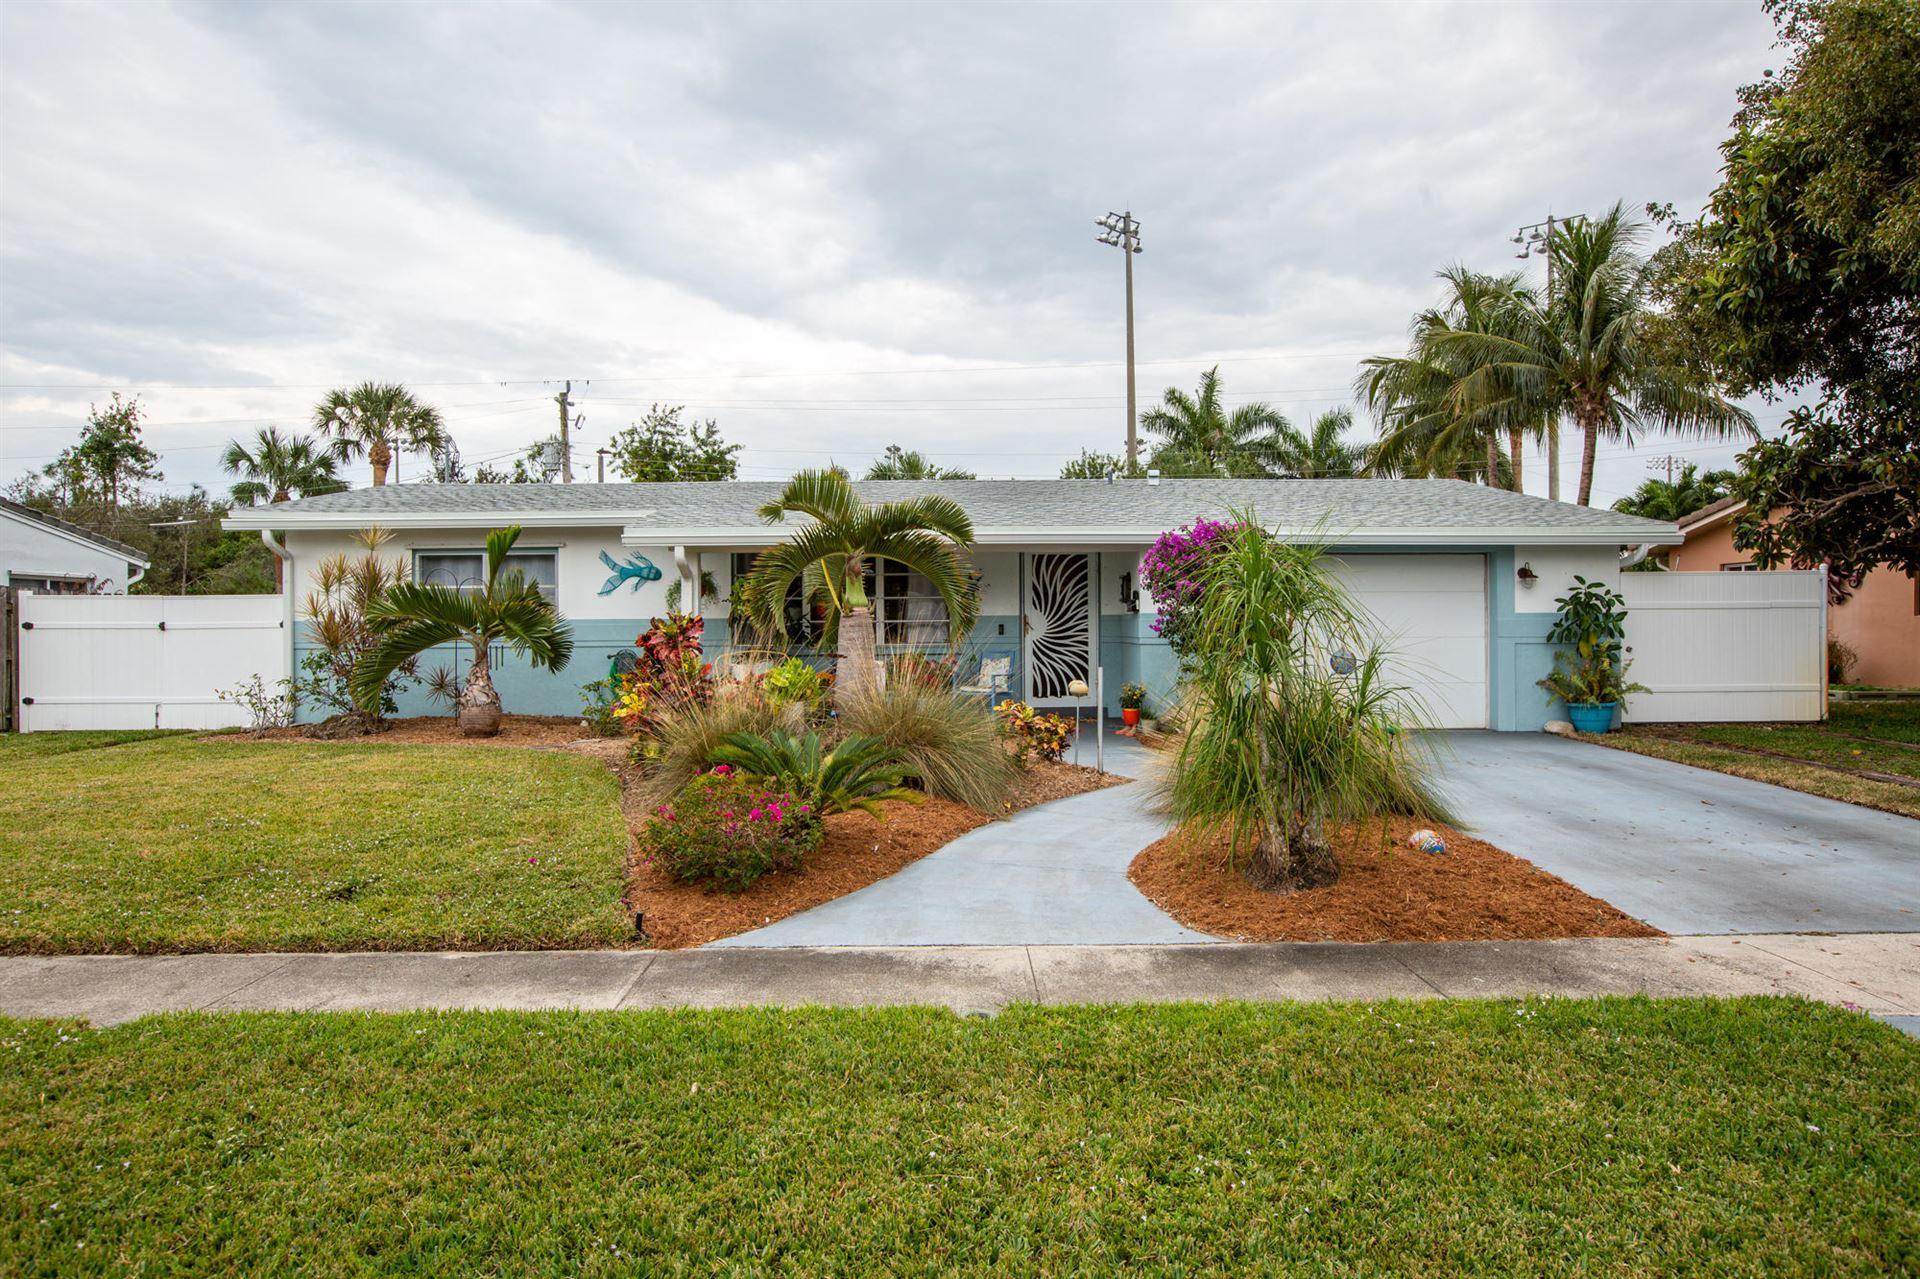 500 SE 4th Street, Deerfield Beach, FL 33441 - #: RX-10684368